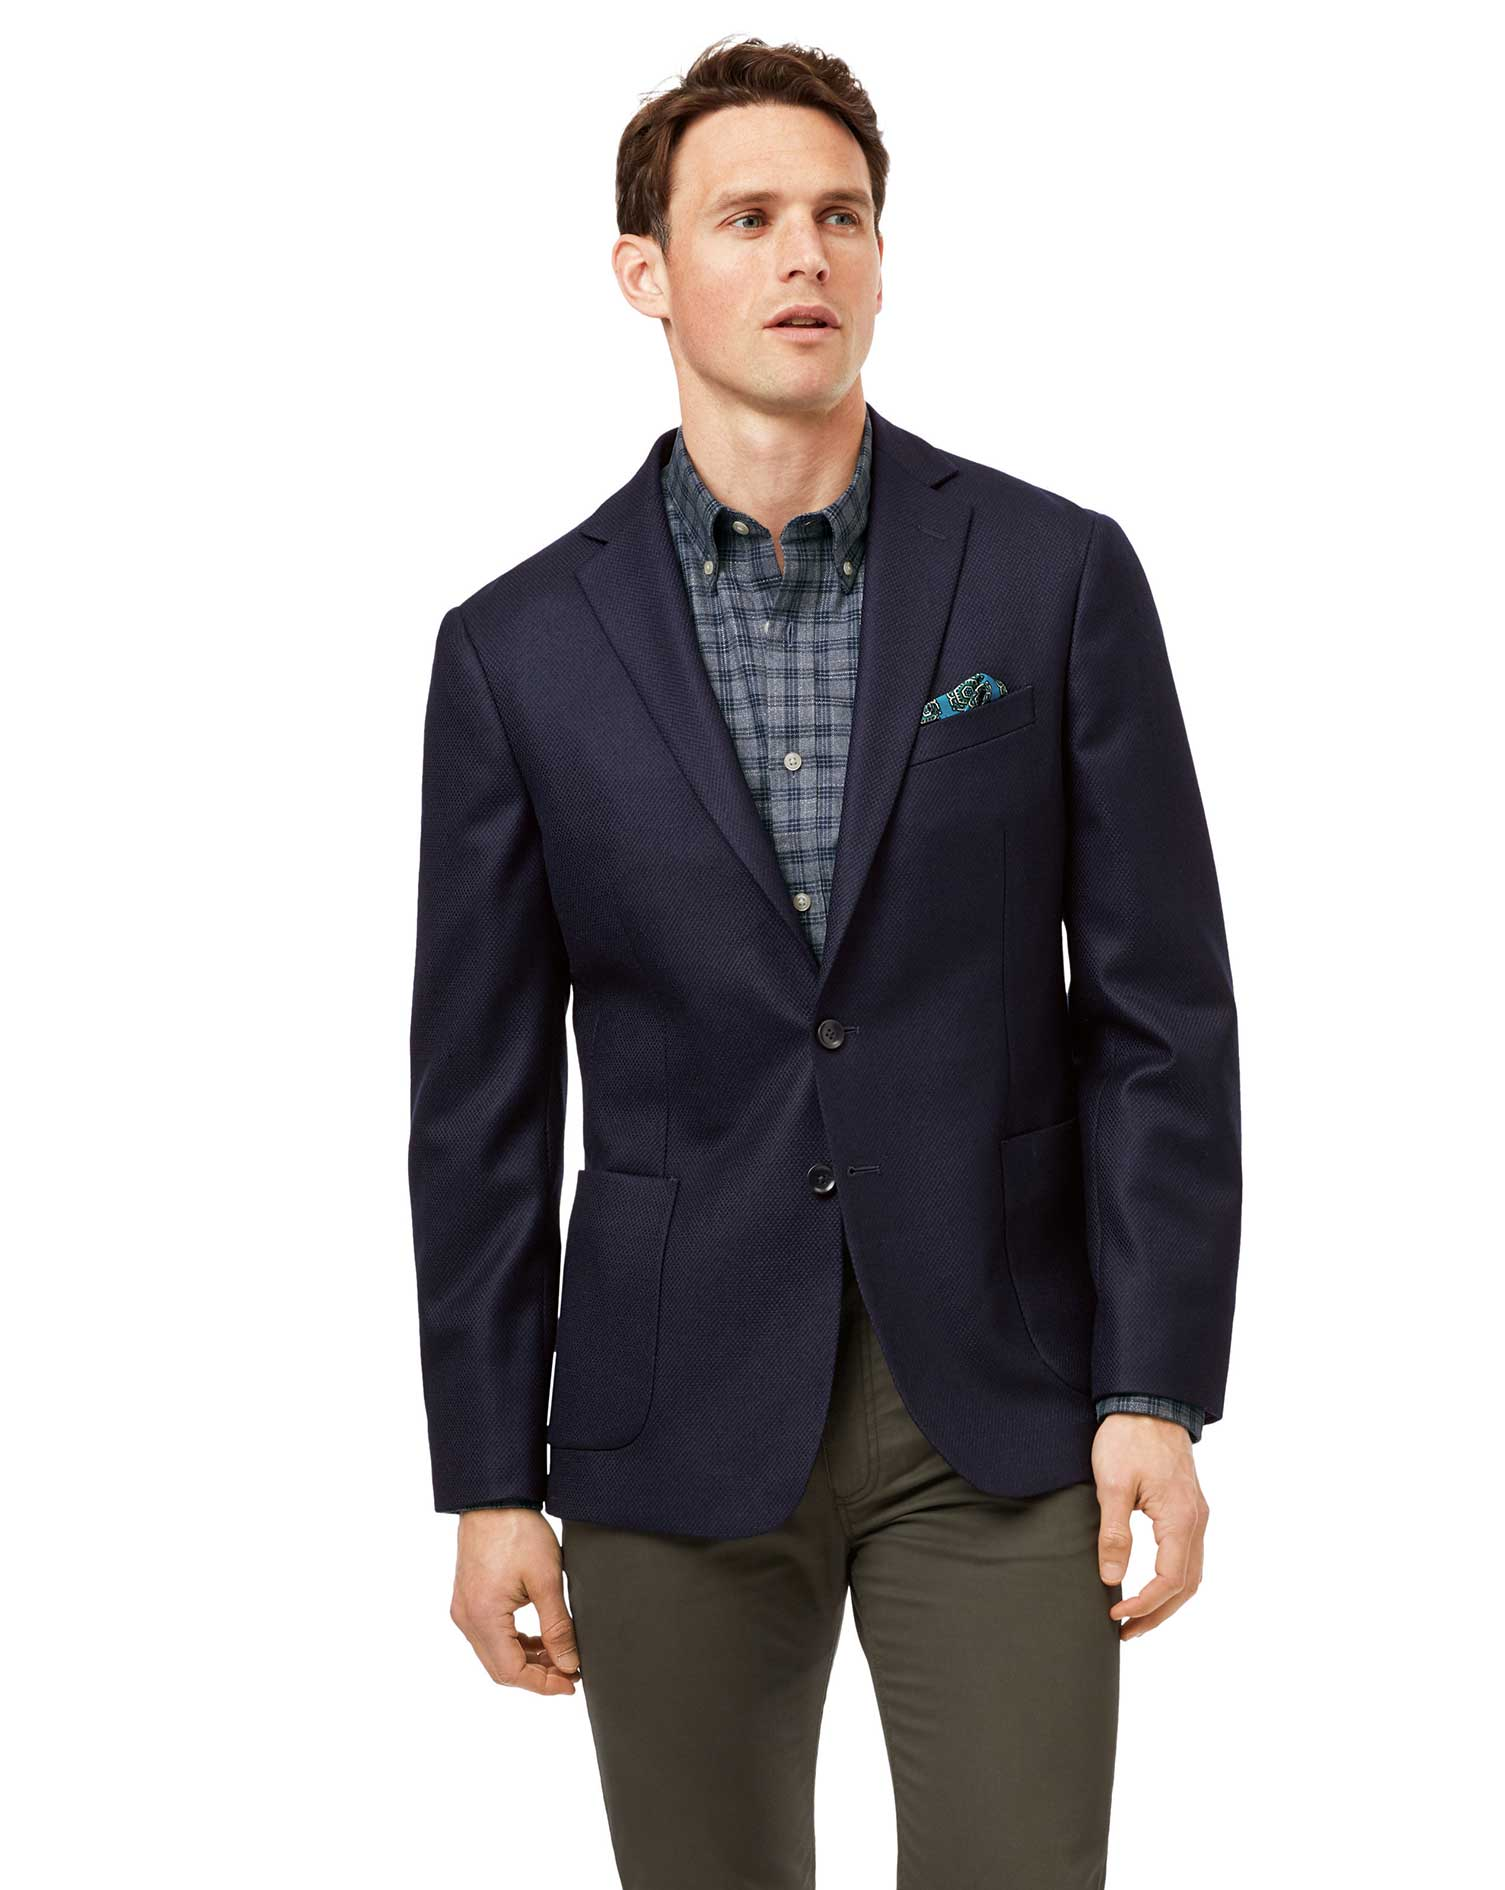 Wool Slim Fit Navy Textured Modern Unlined Jacket